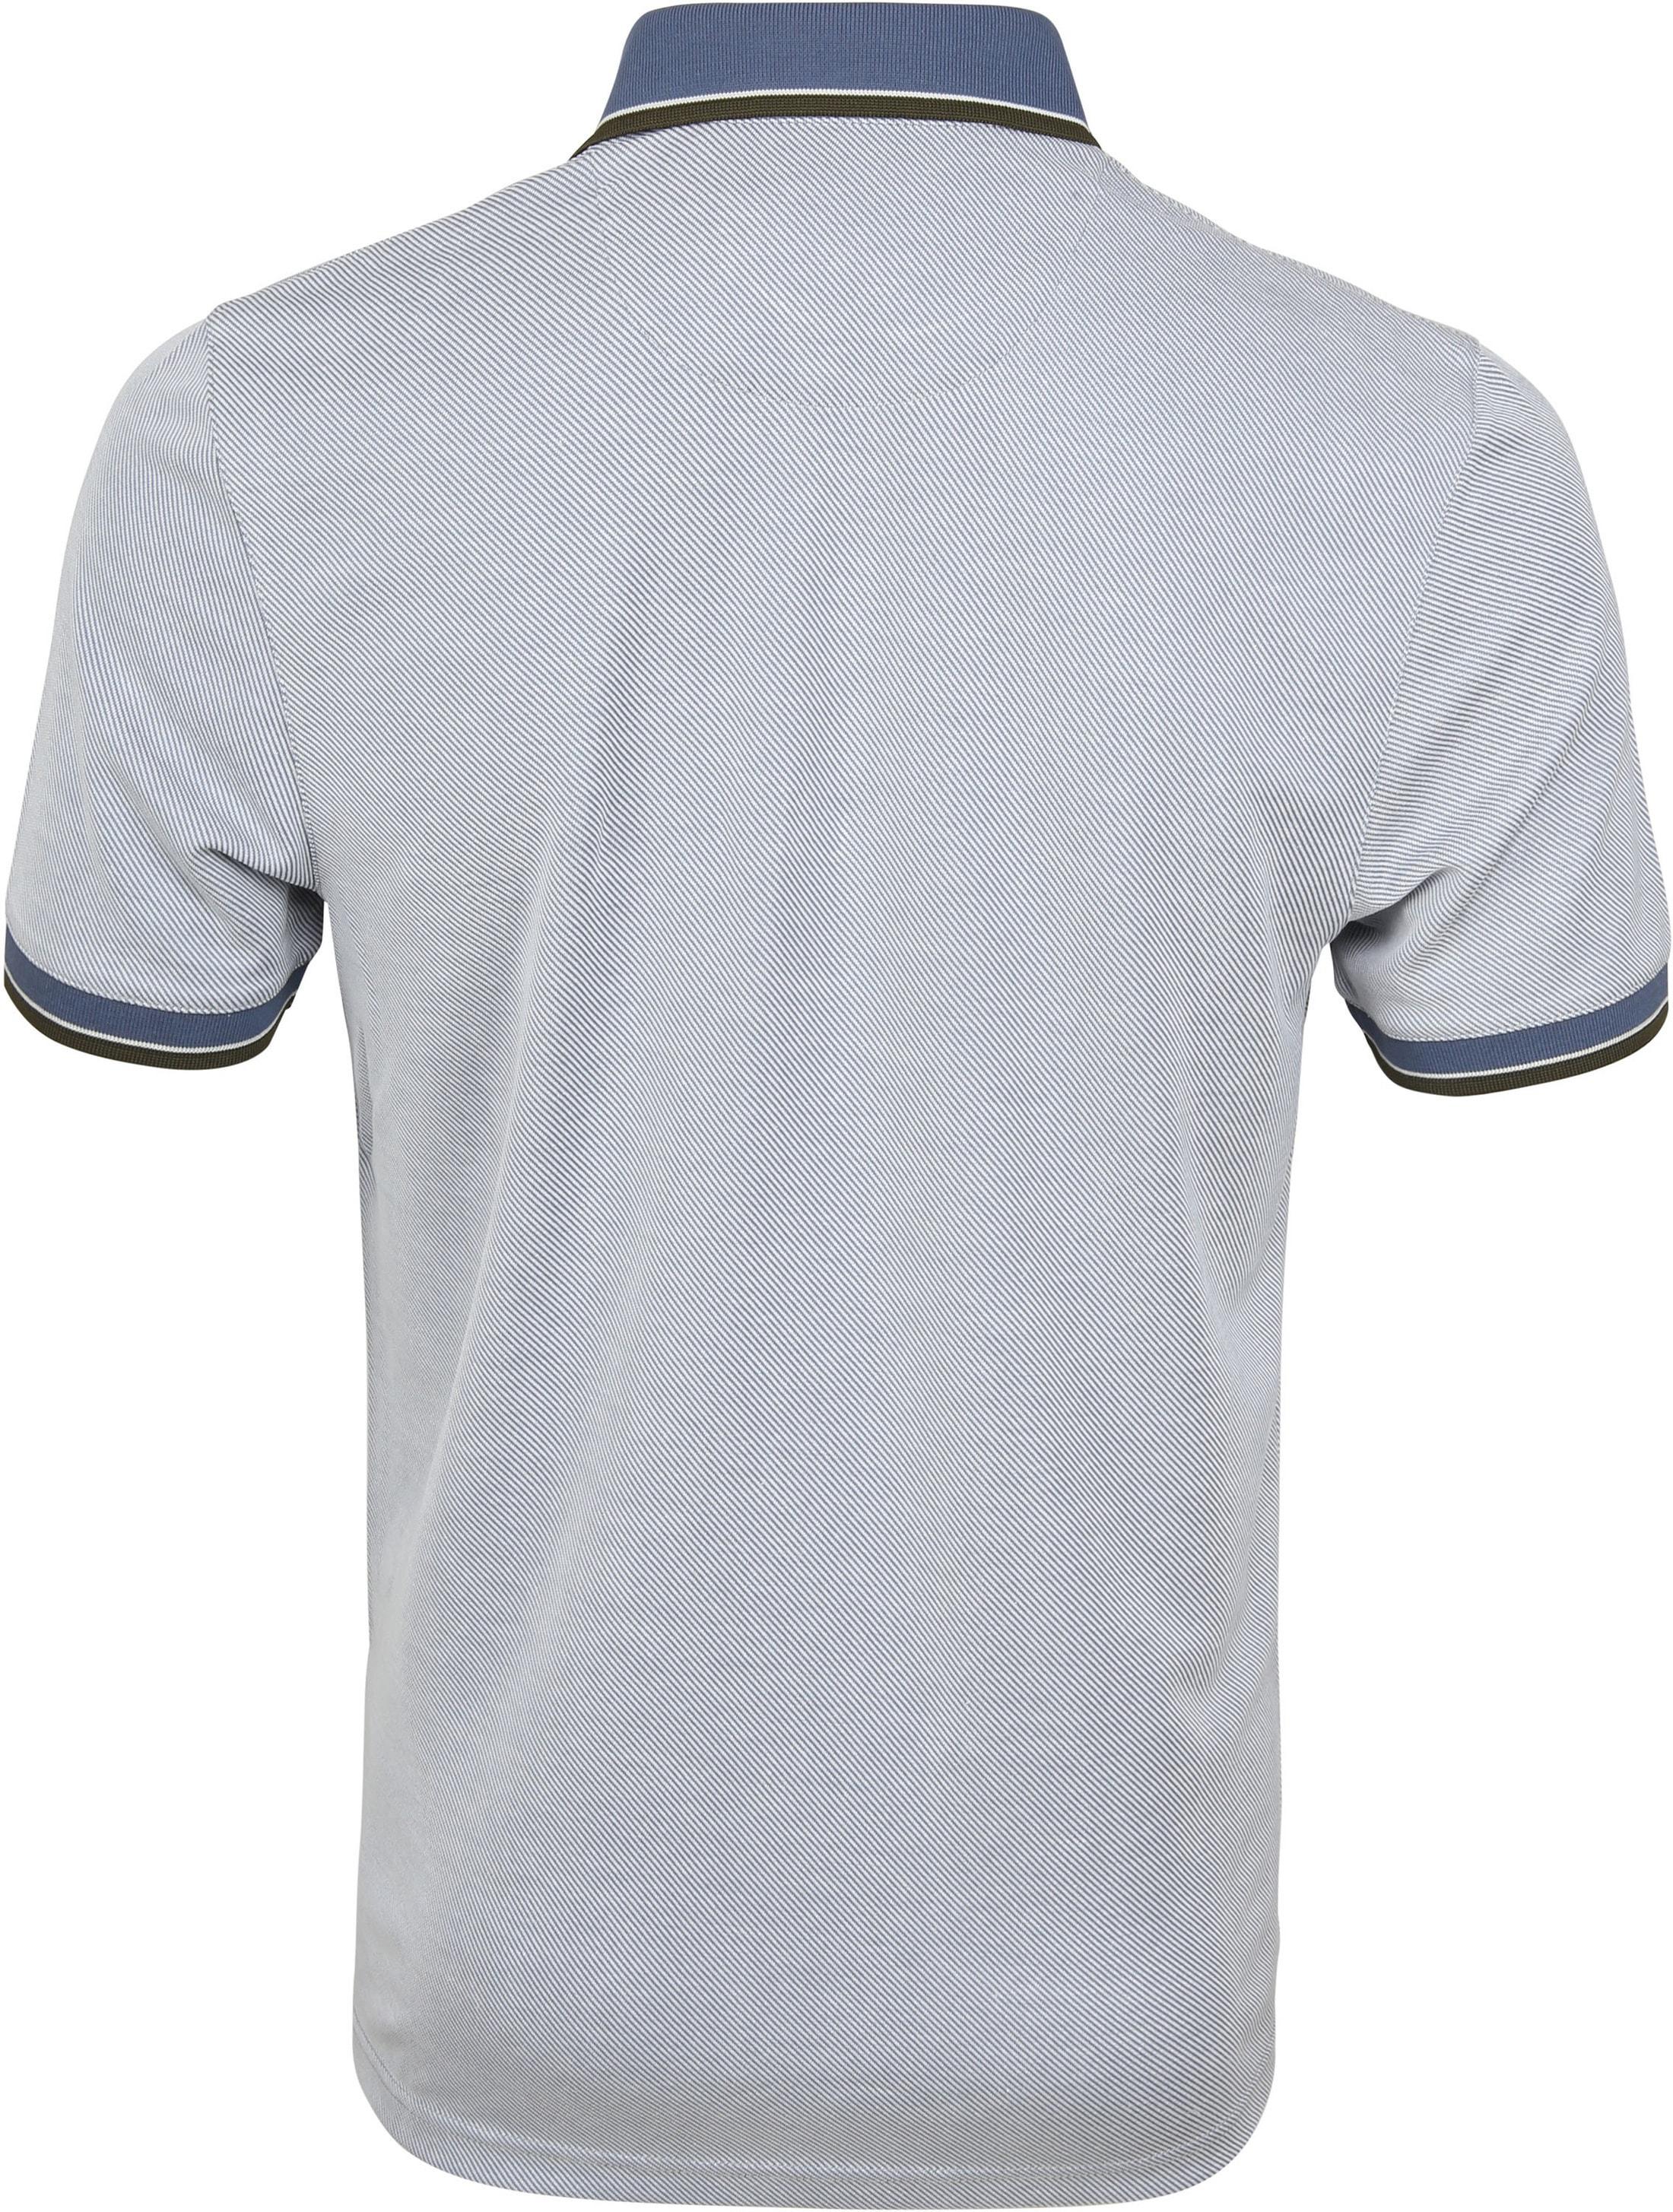 Ted Baker Habtat Poloshirt Blue foto 3